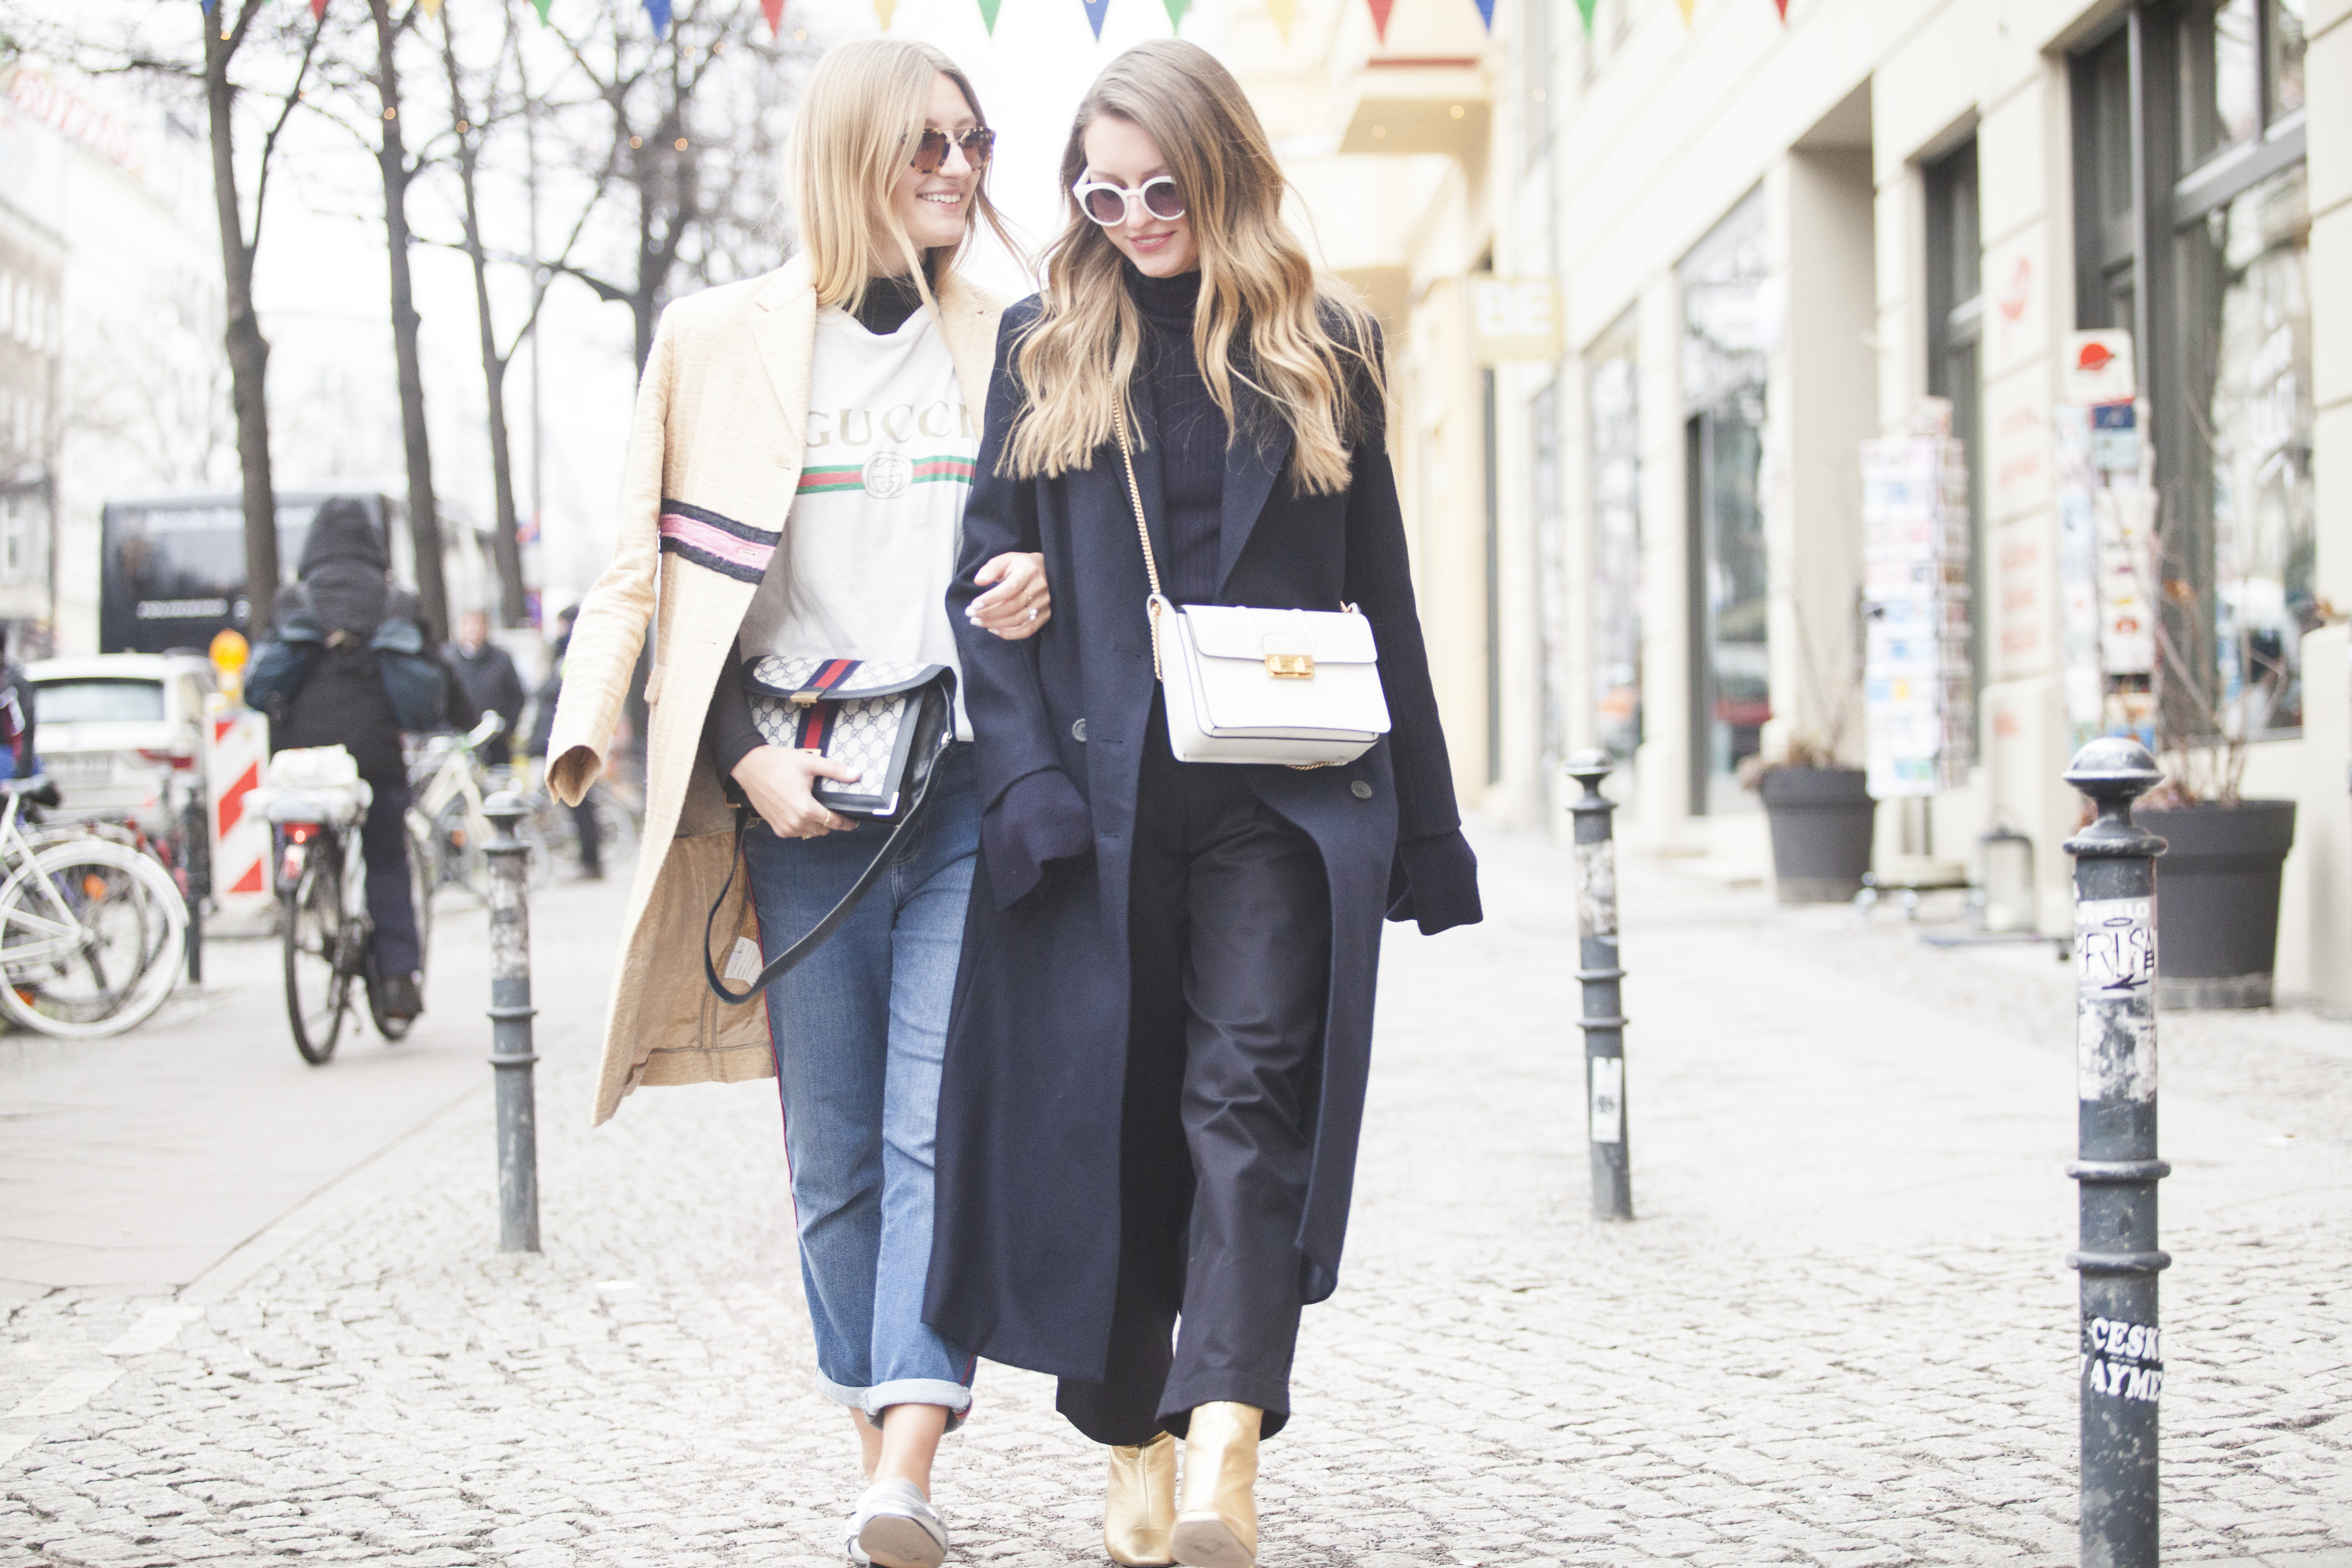 berlin_fashion_week_streetstyle_alexandra_seifert_vivalamoda_blog_3